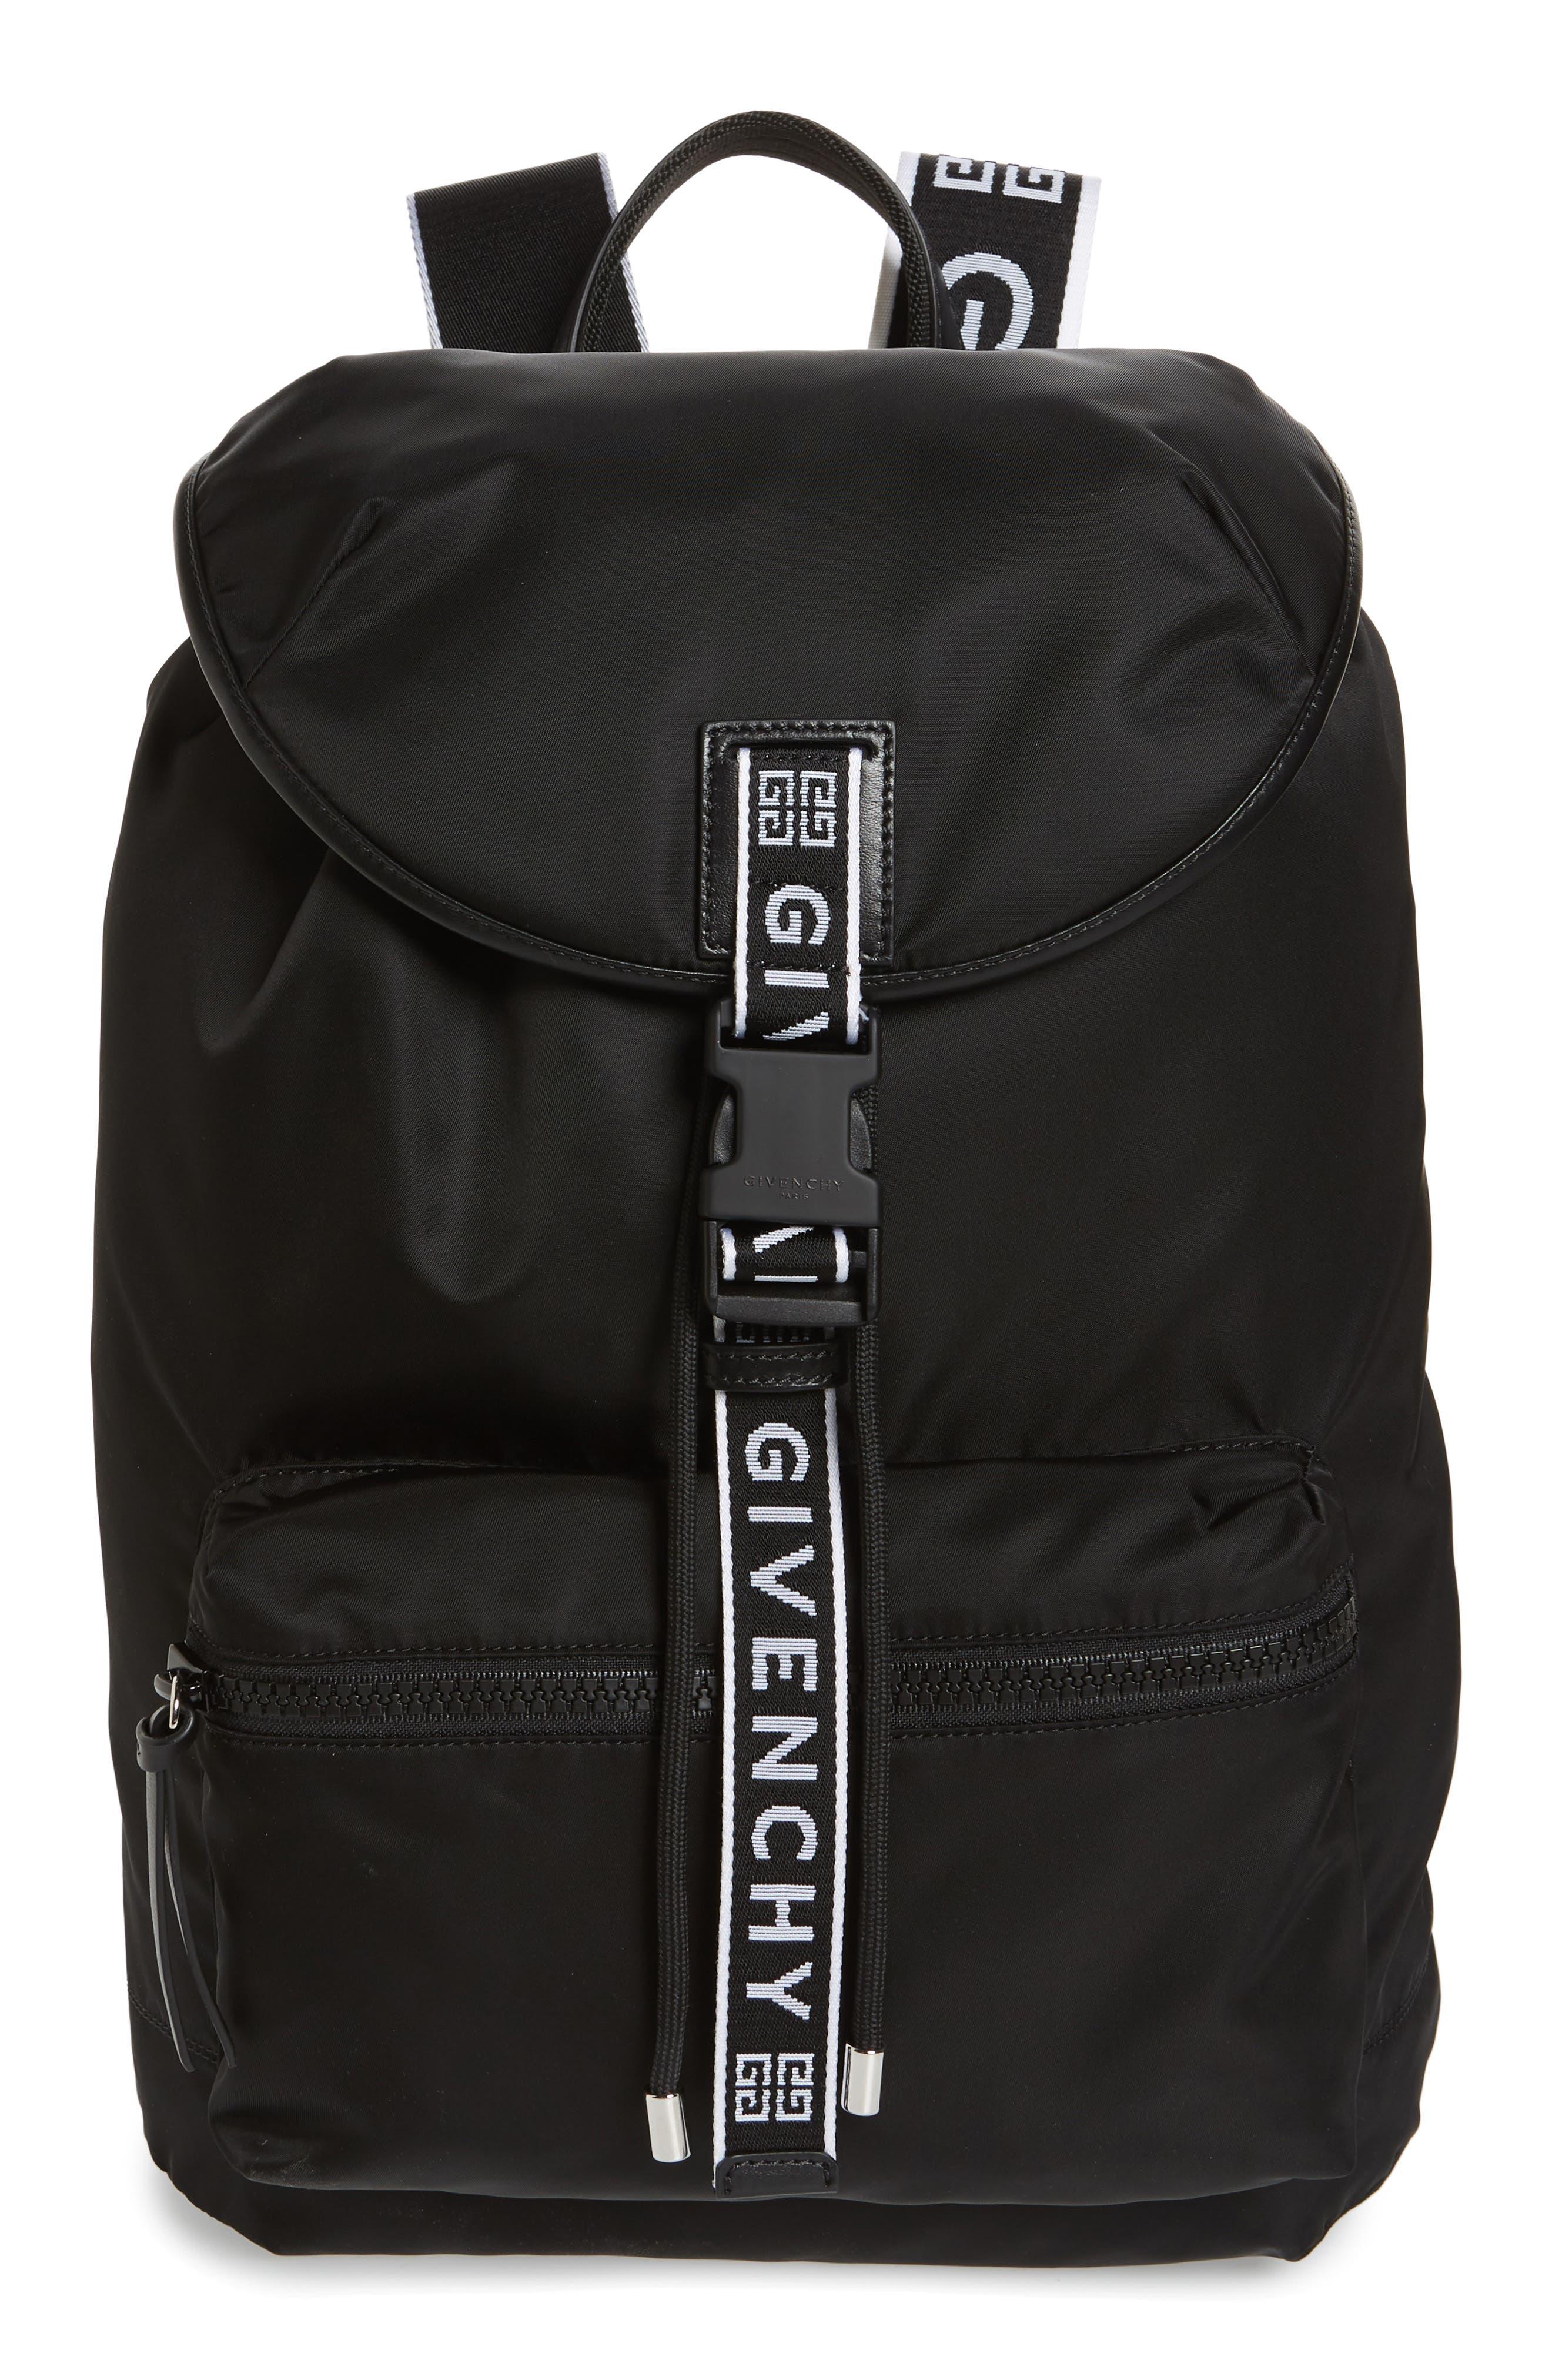 6c792aefe0 Men's Givenchy | Nordstrom